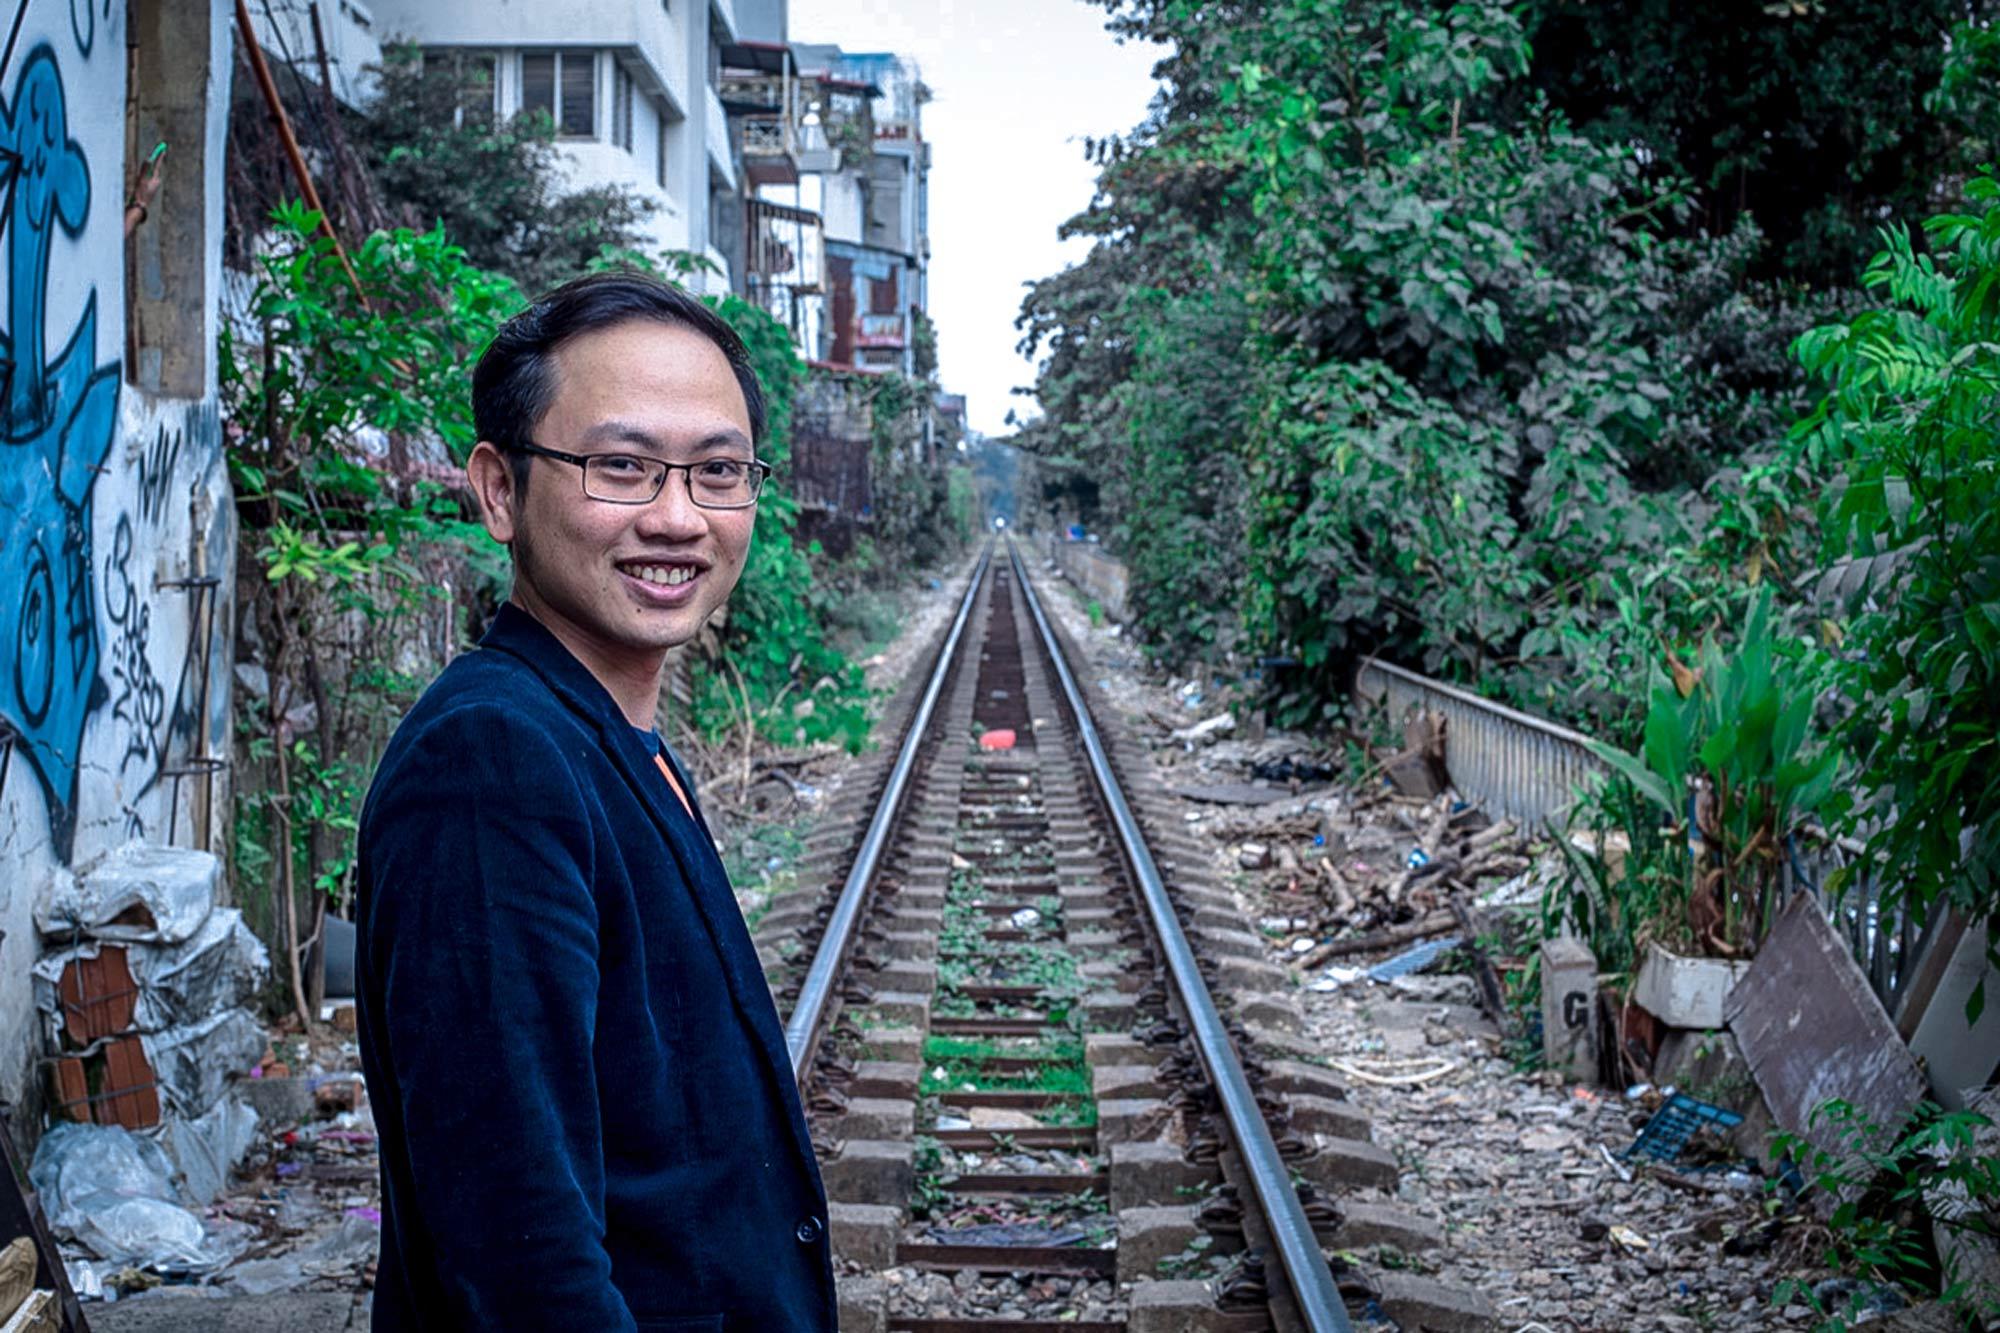 VTV Vietnam TV Producer On Storytelling For An International Audience